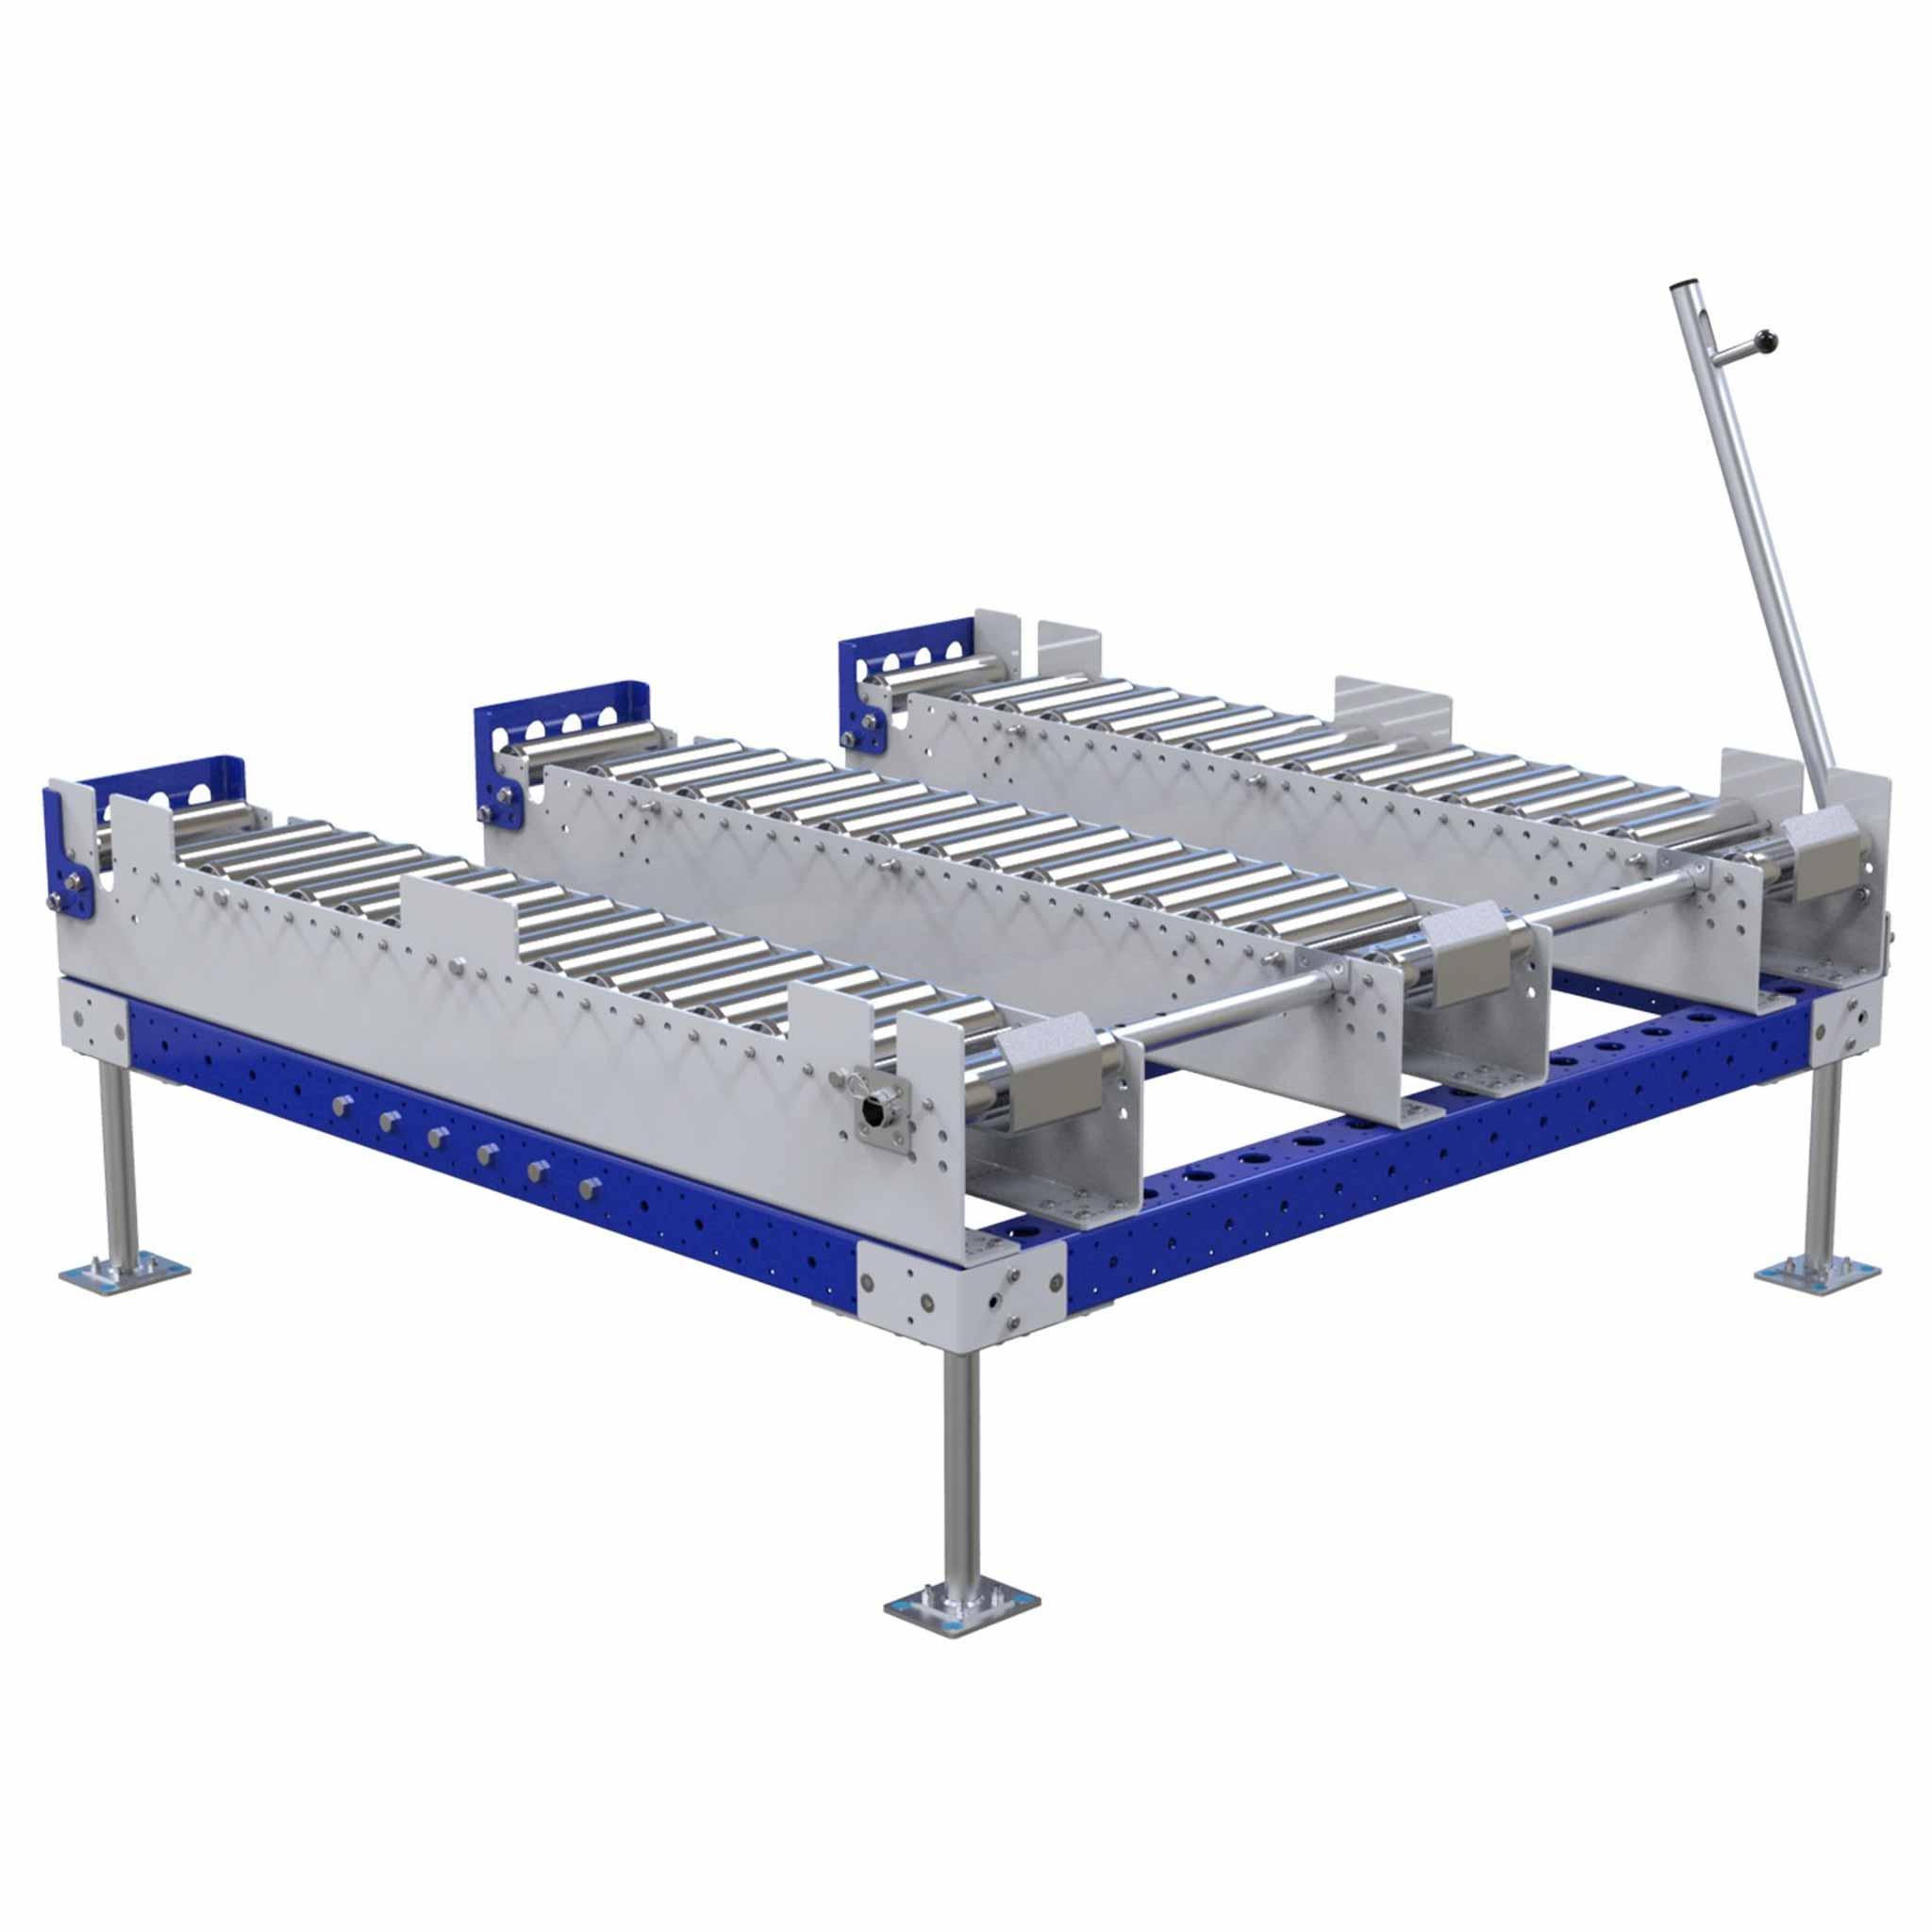 Conveyor Station - 1260 x 1260 mm